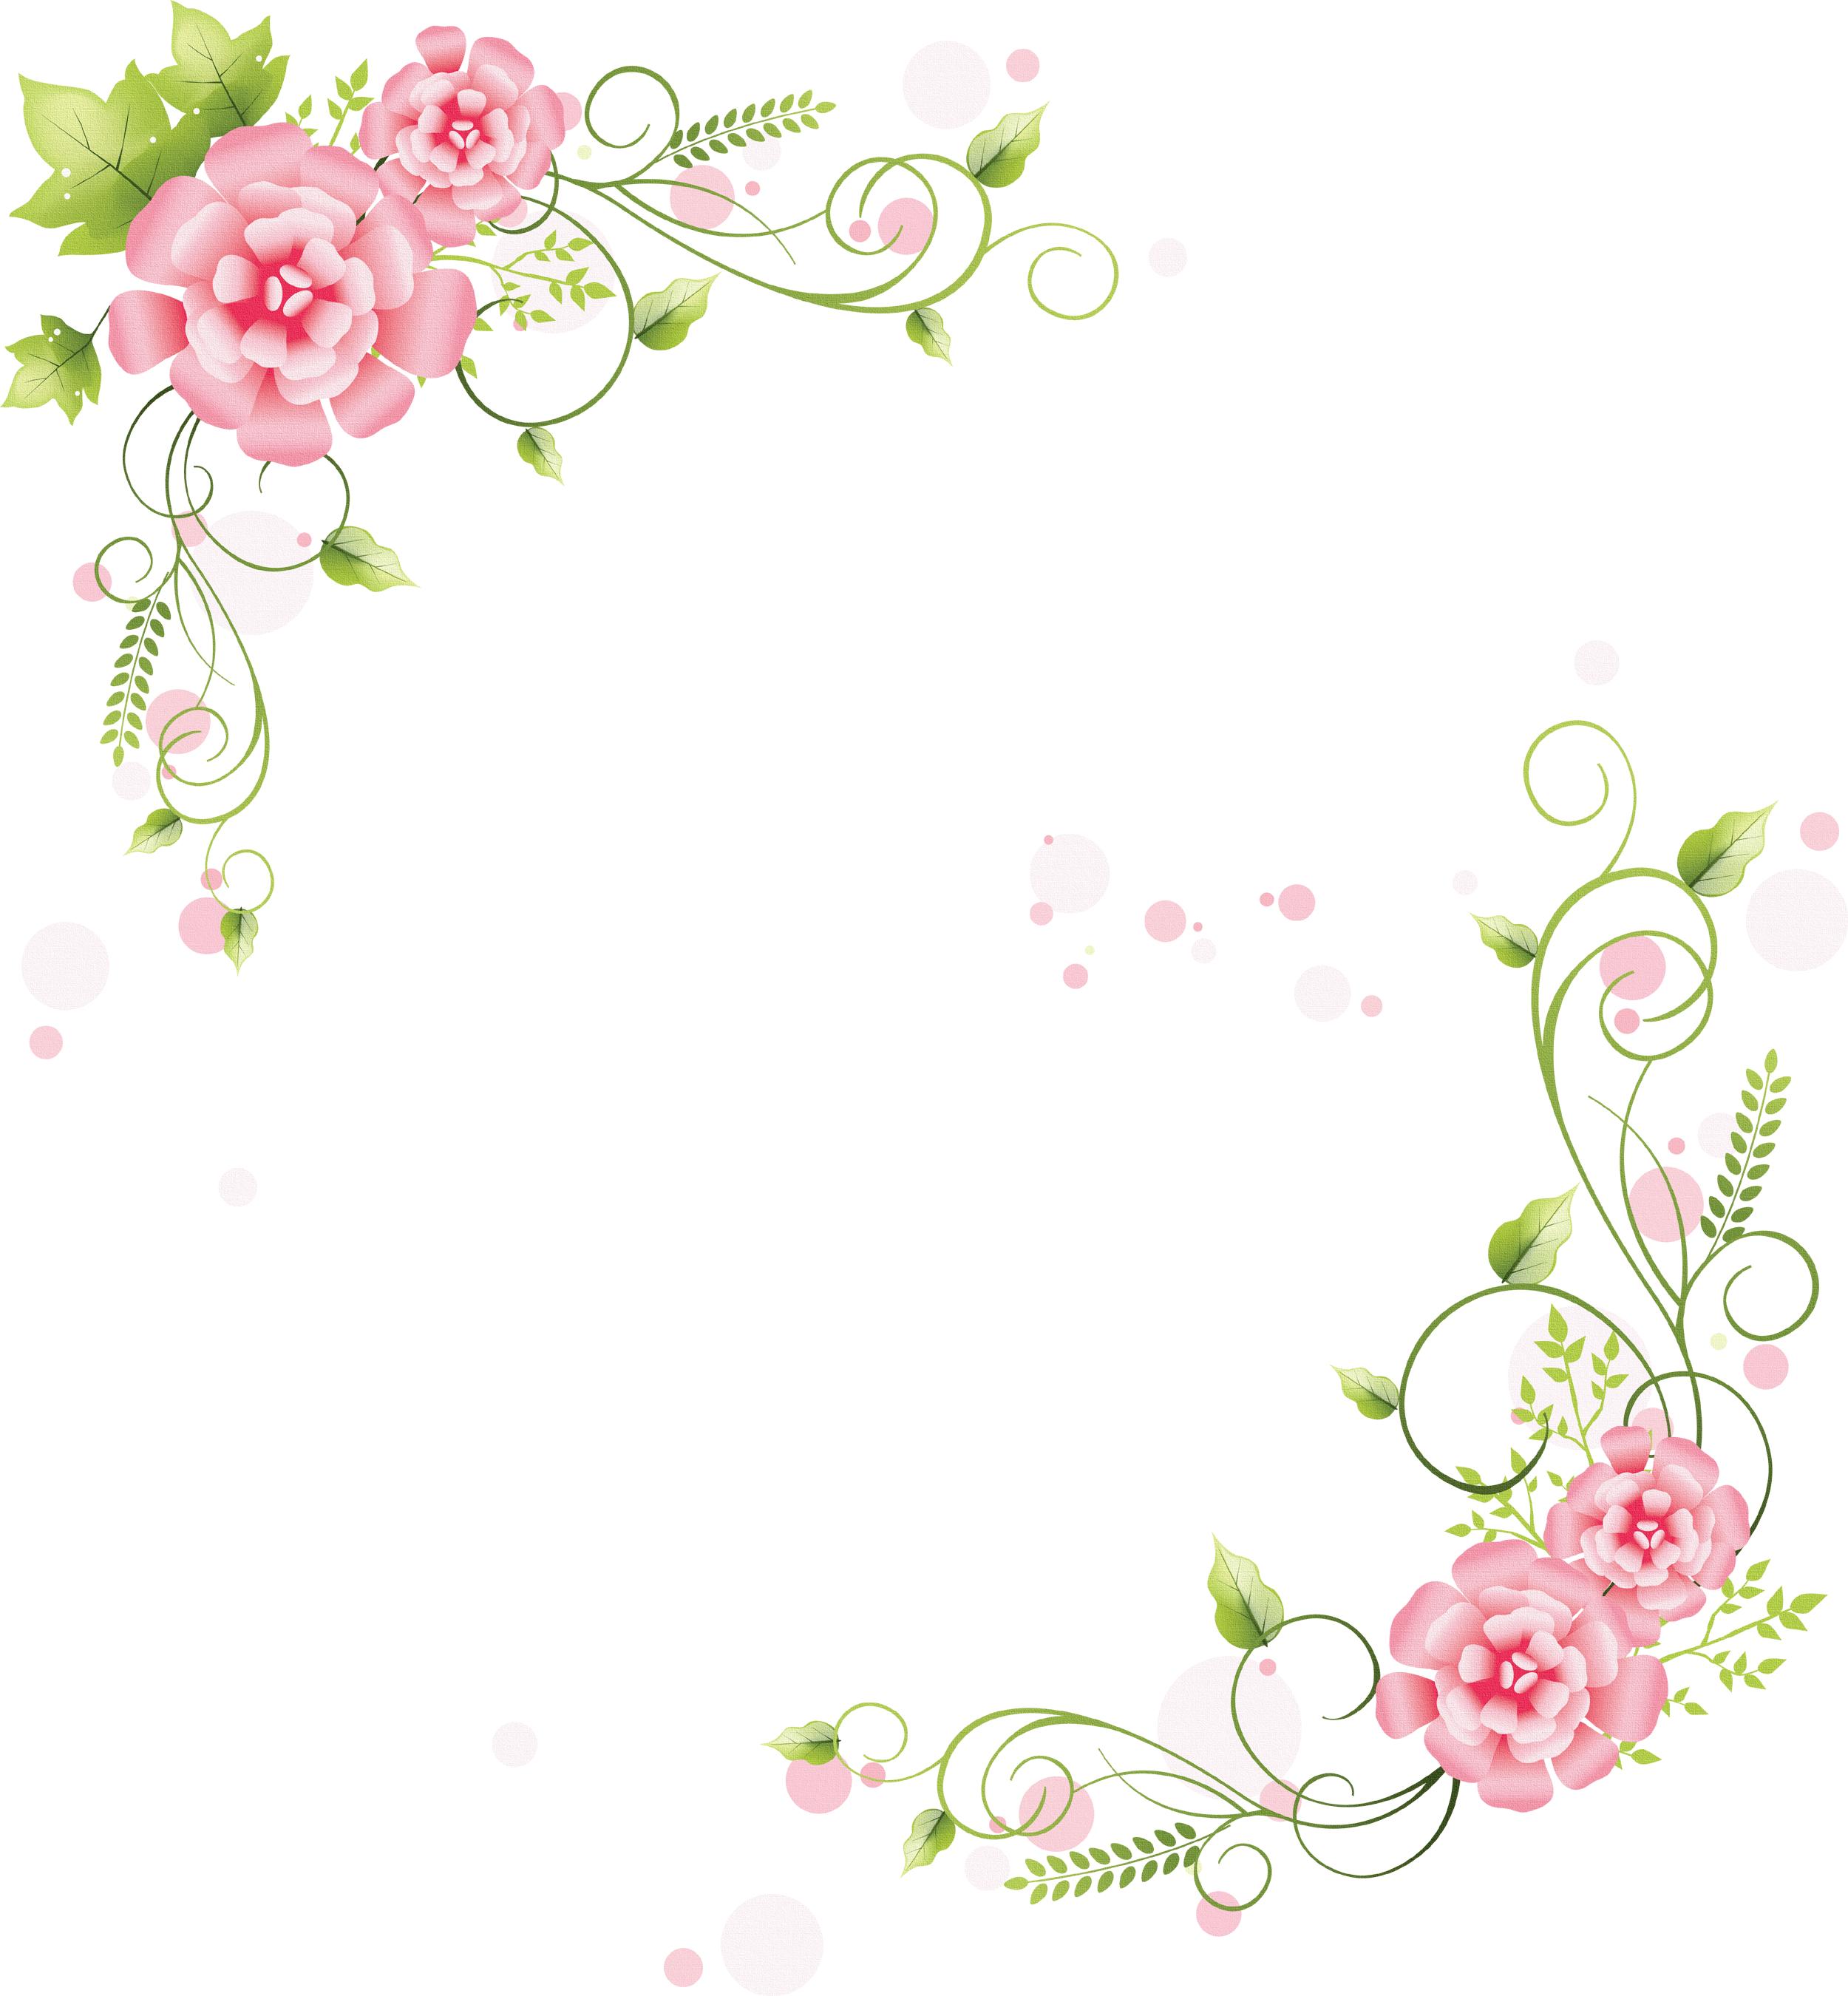 Imprimiveis pinterest fundos da flor flor e fundos vintage - Flowers Png No 186 Papeis